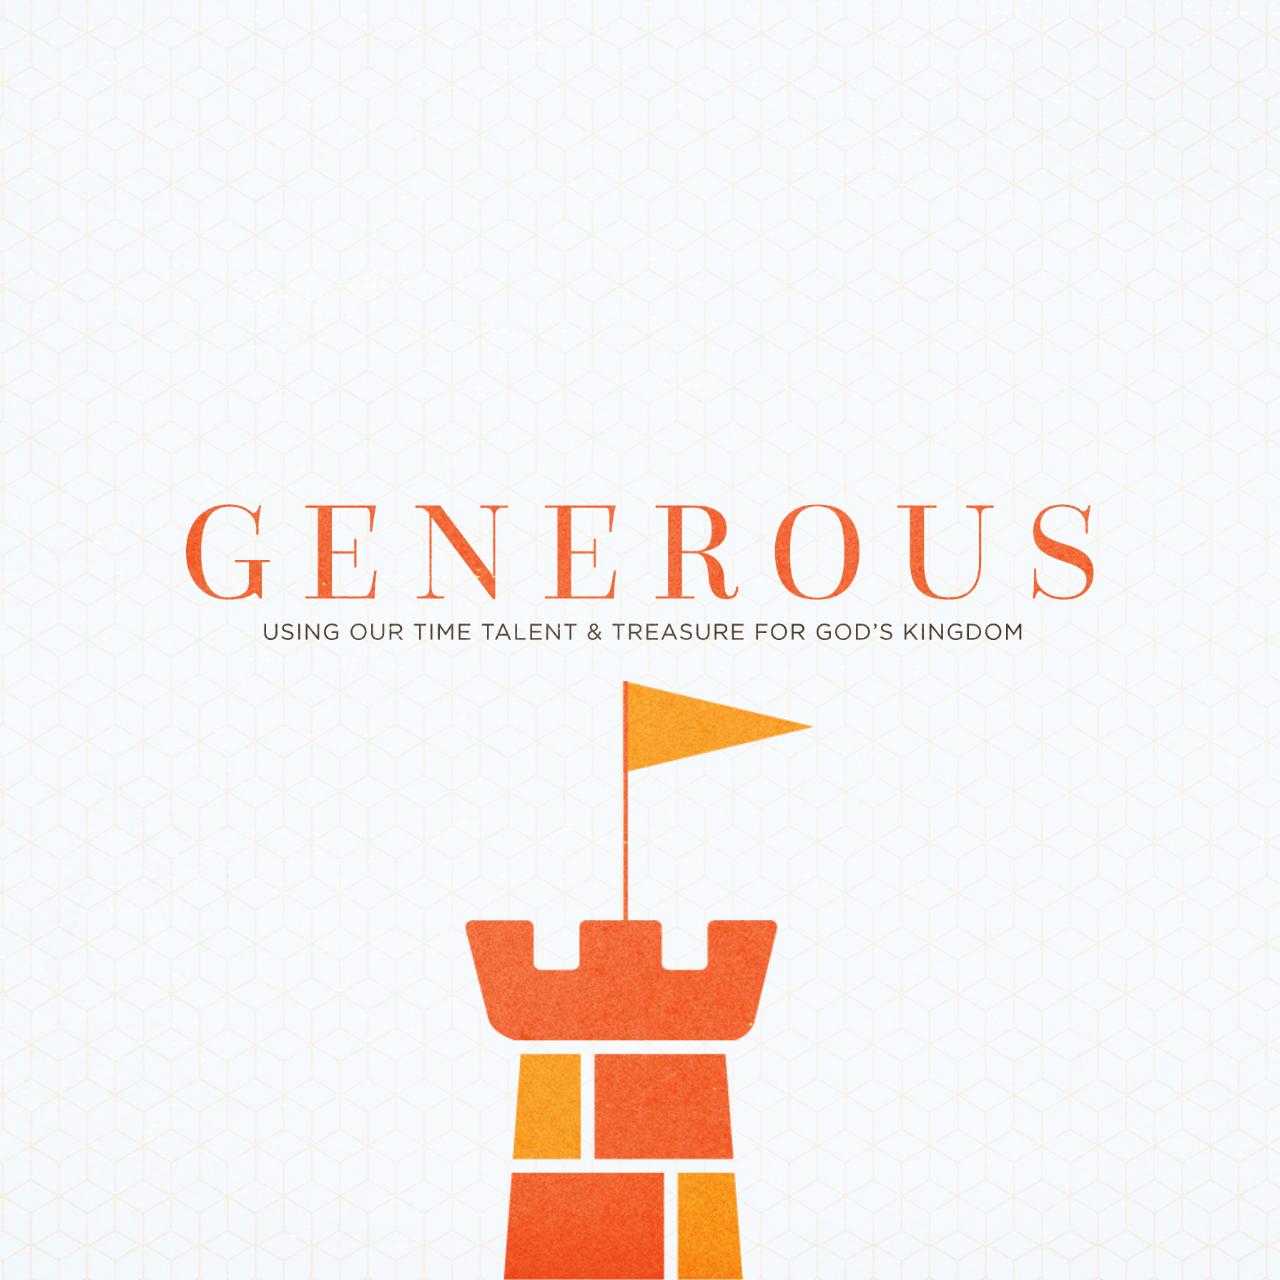 Generous: How Do We Invest It?